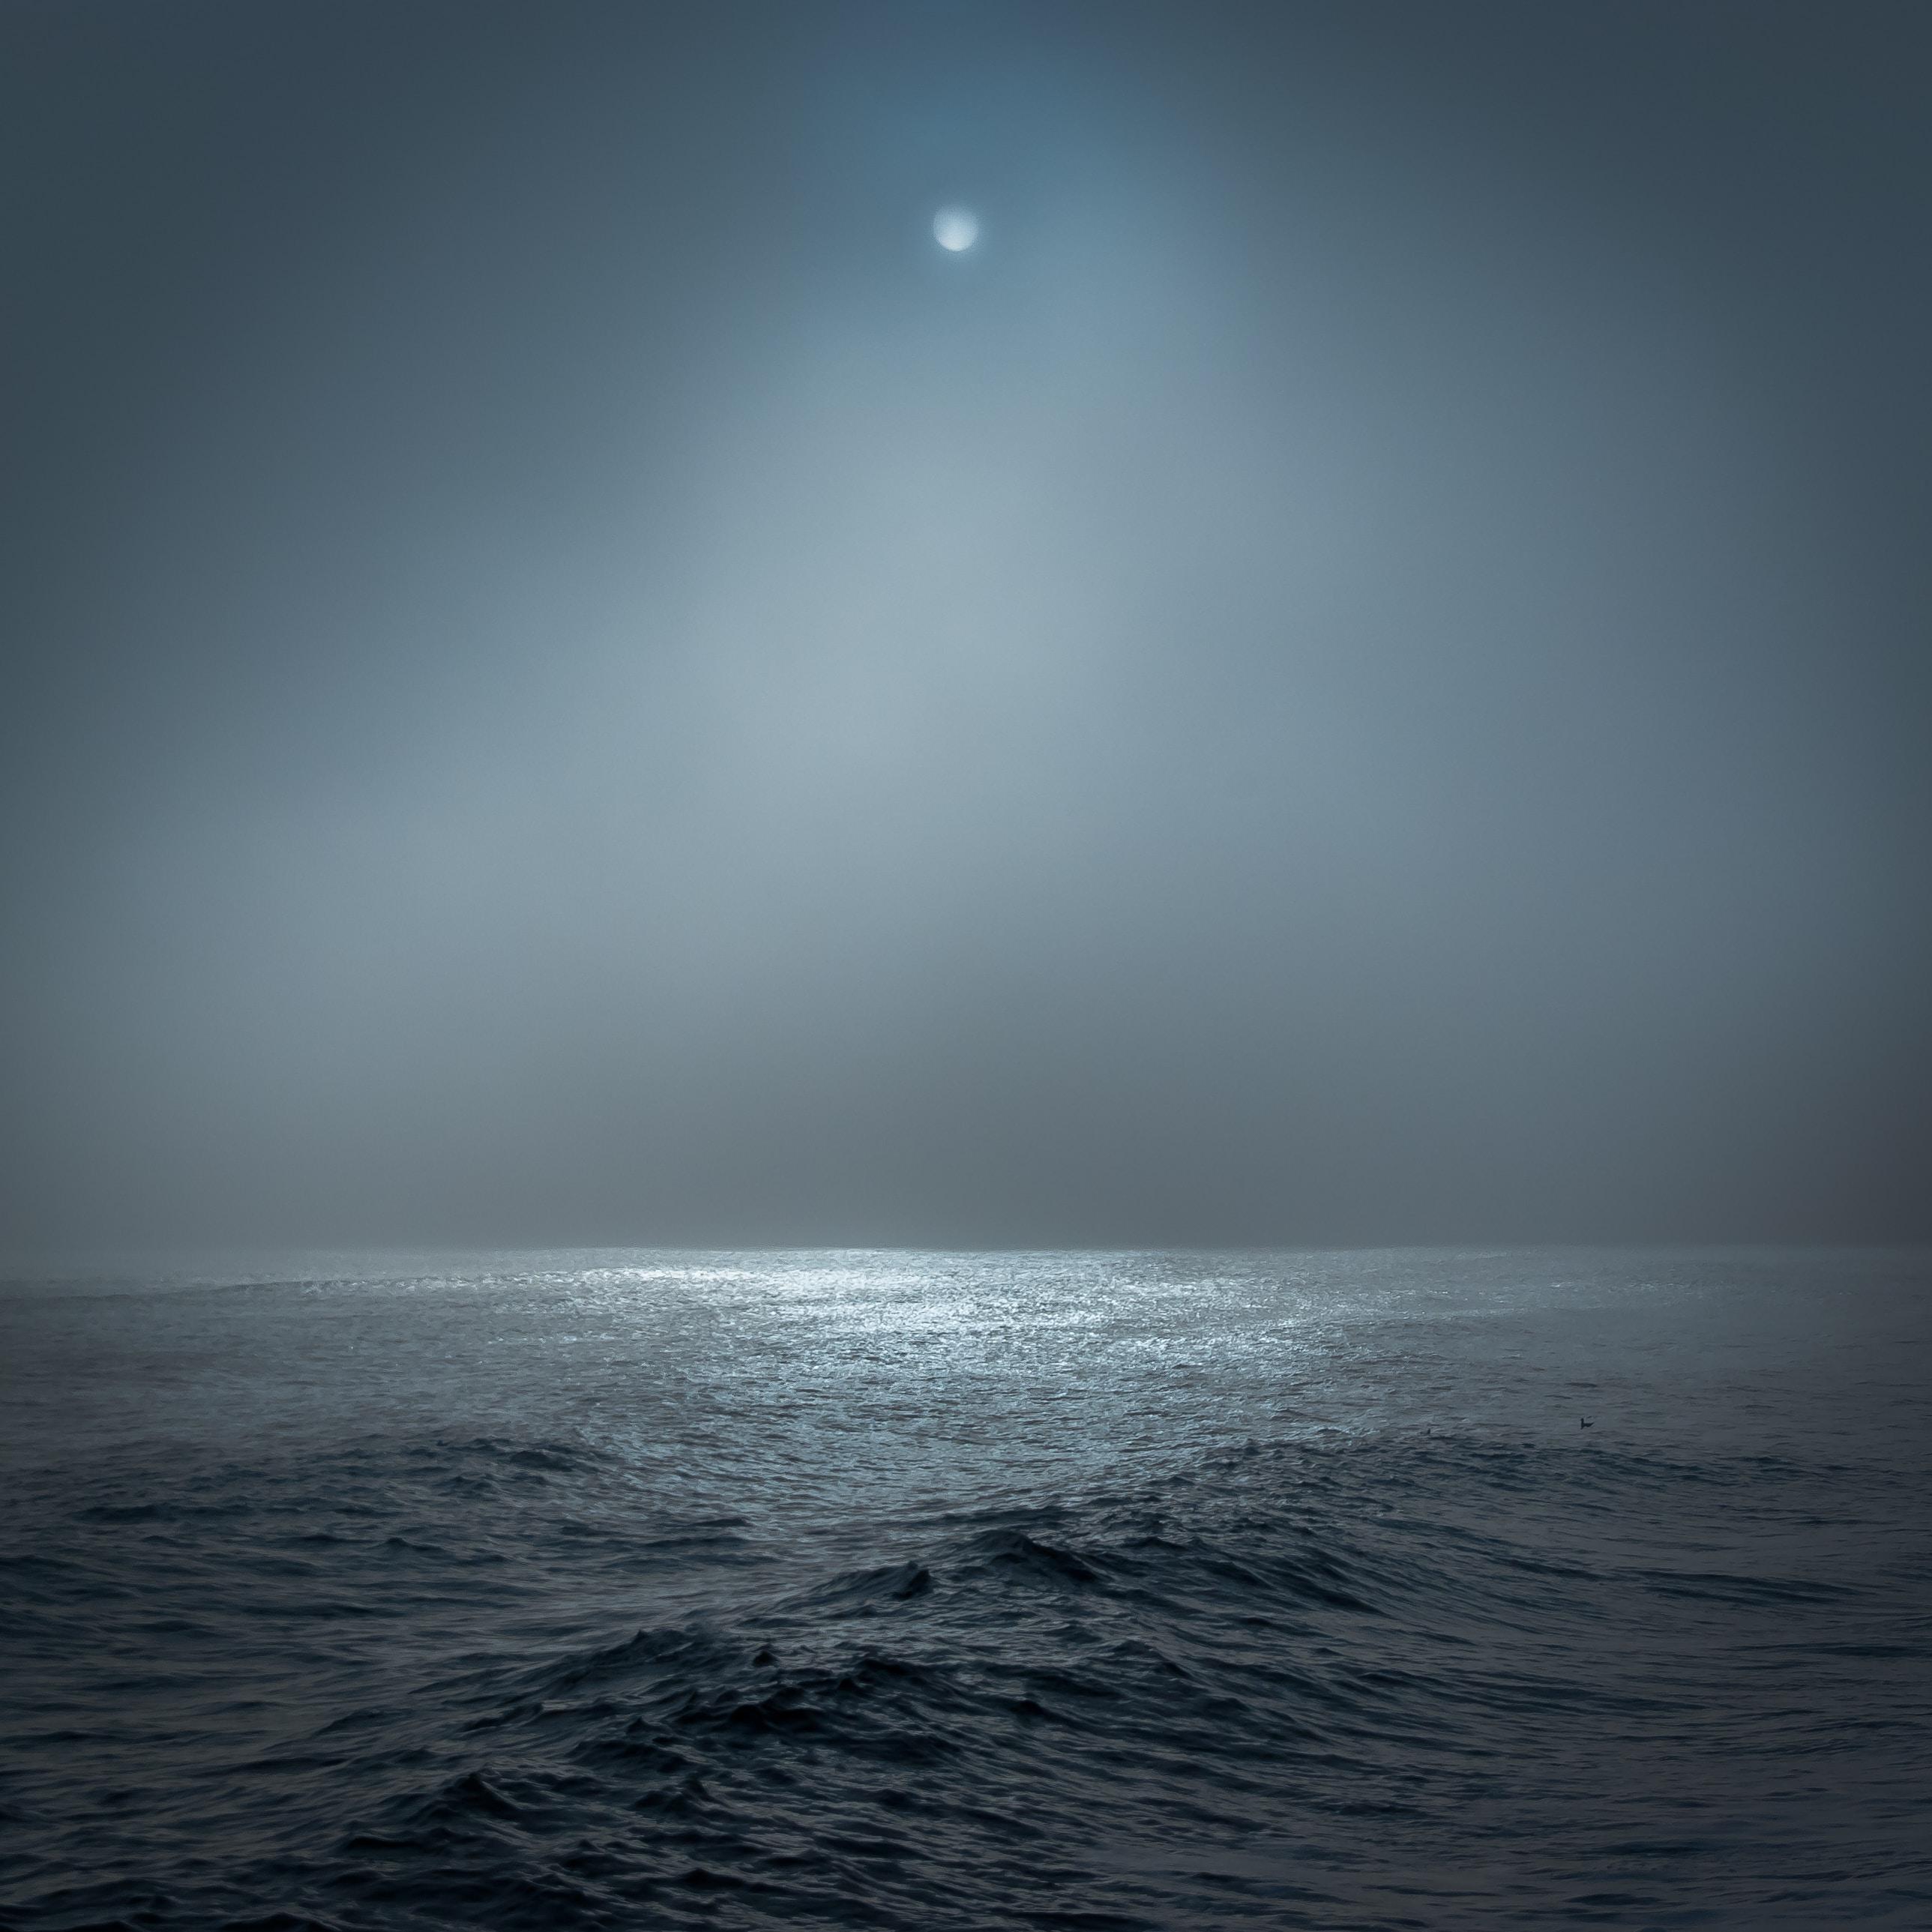 Dim moonlight in the sky over a dark sea